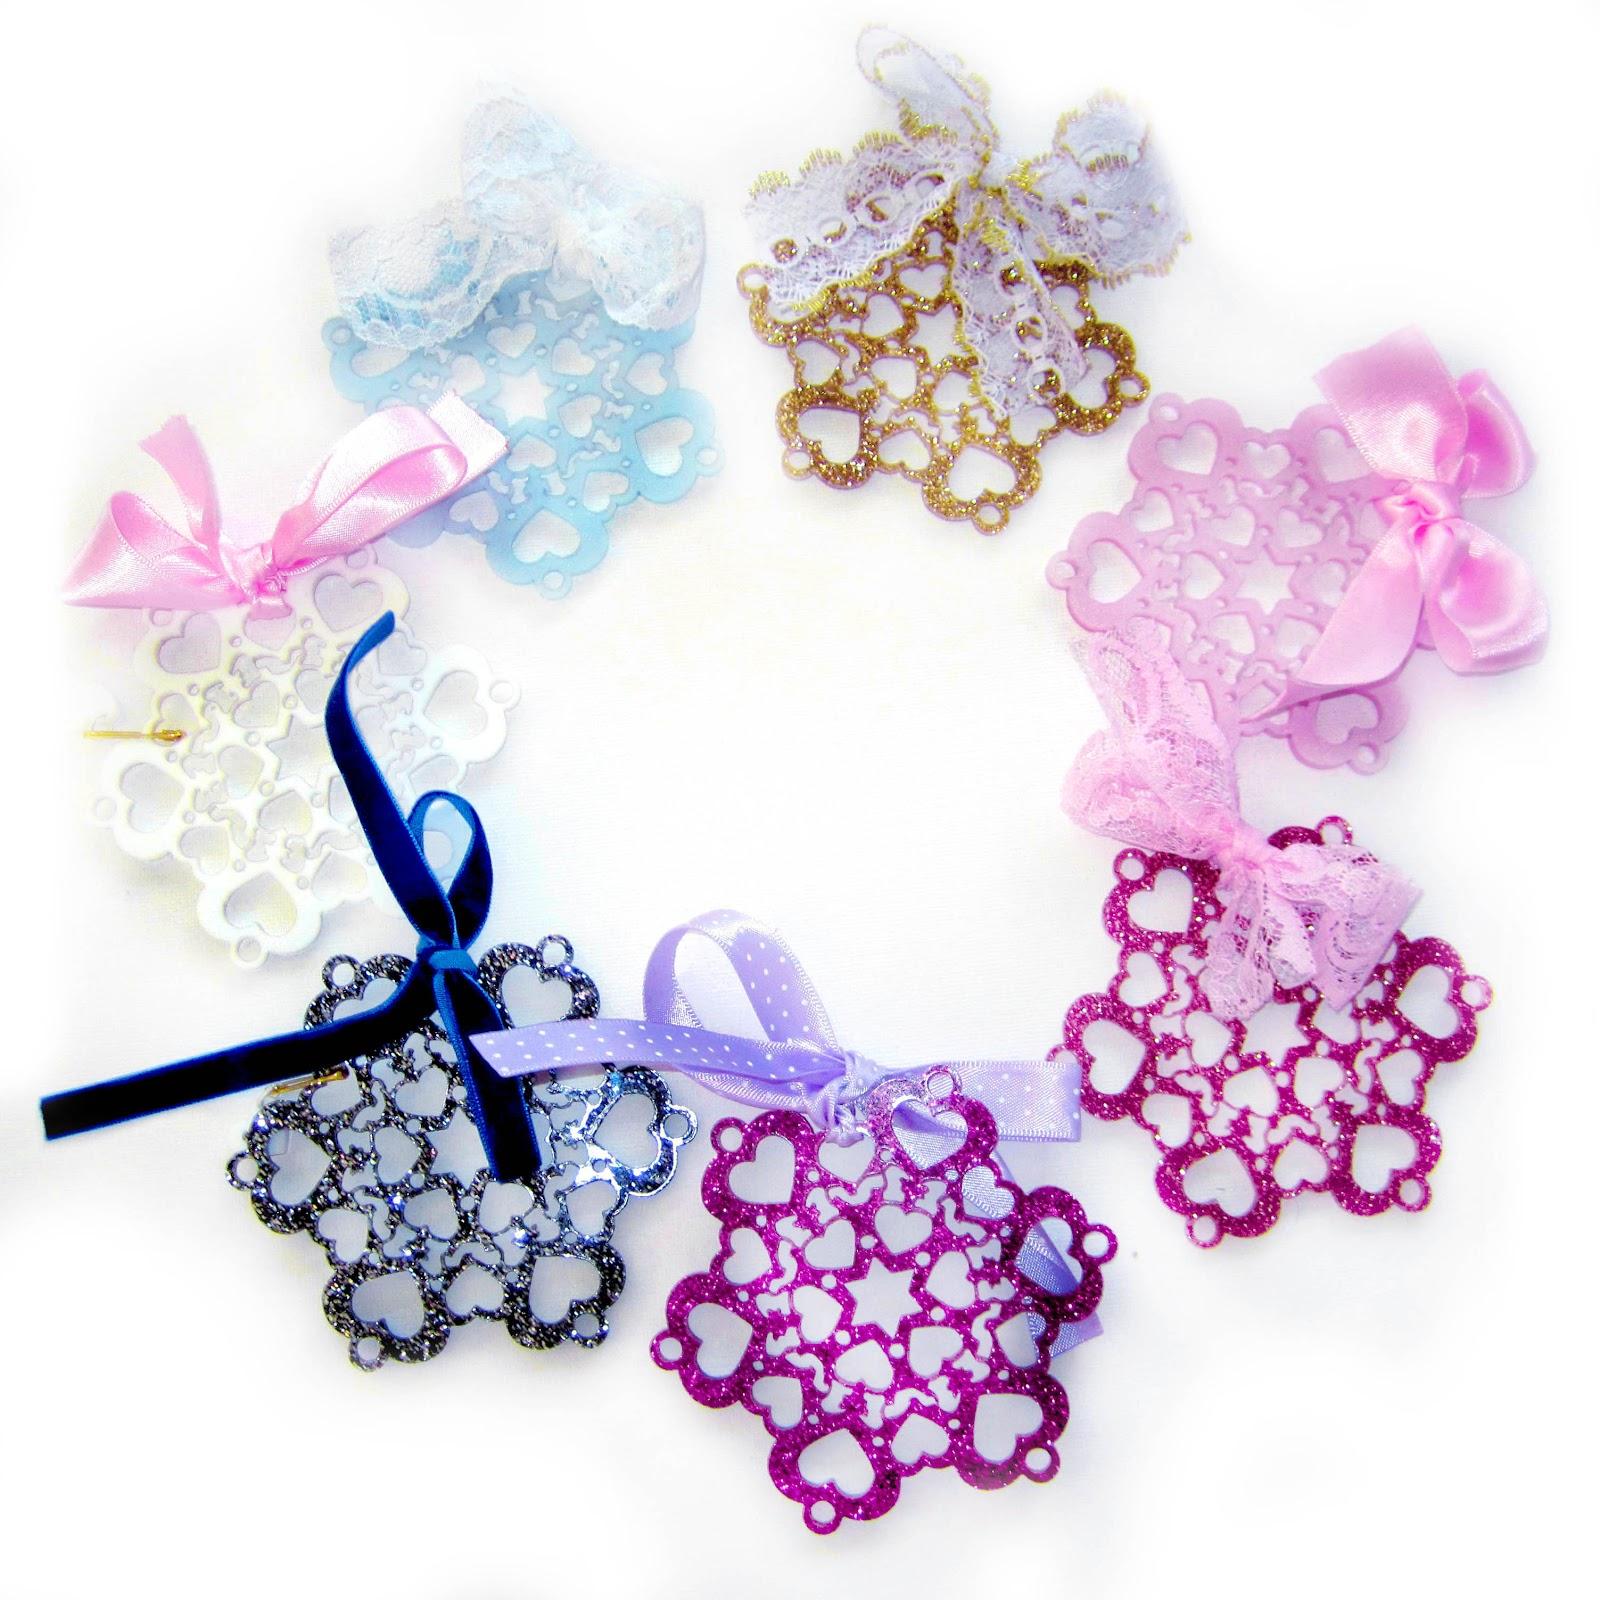 Roxie Sweetheart... the Blog!: Hyper Japan Christmas 2012!